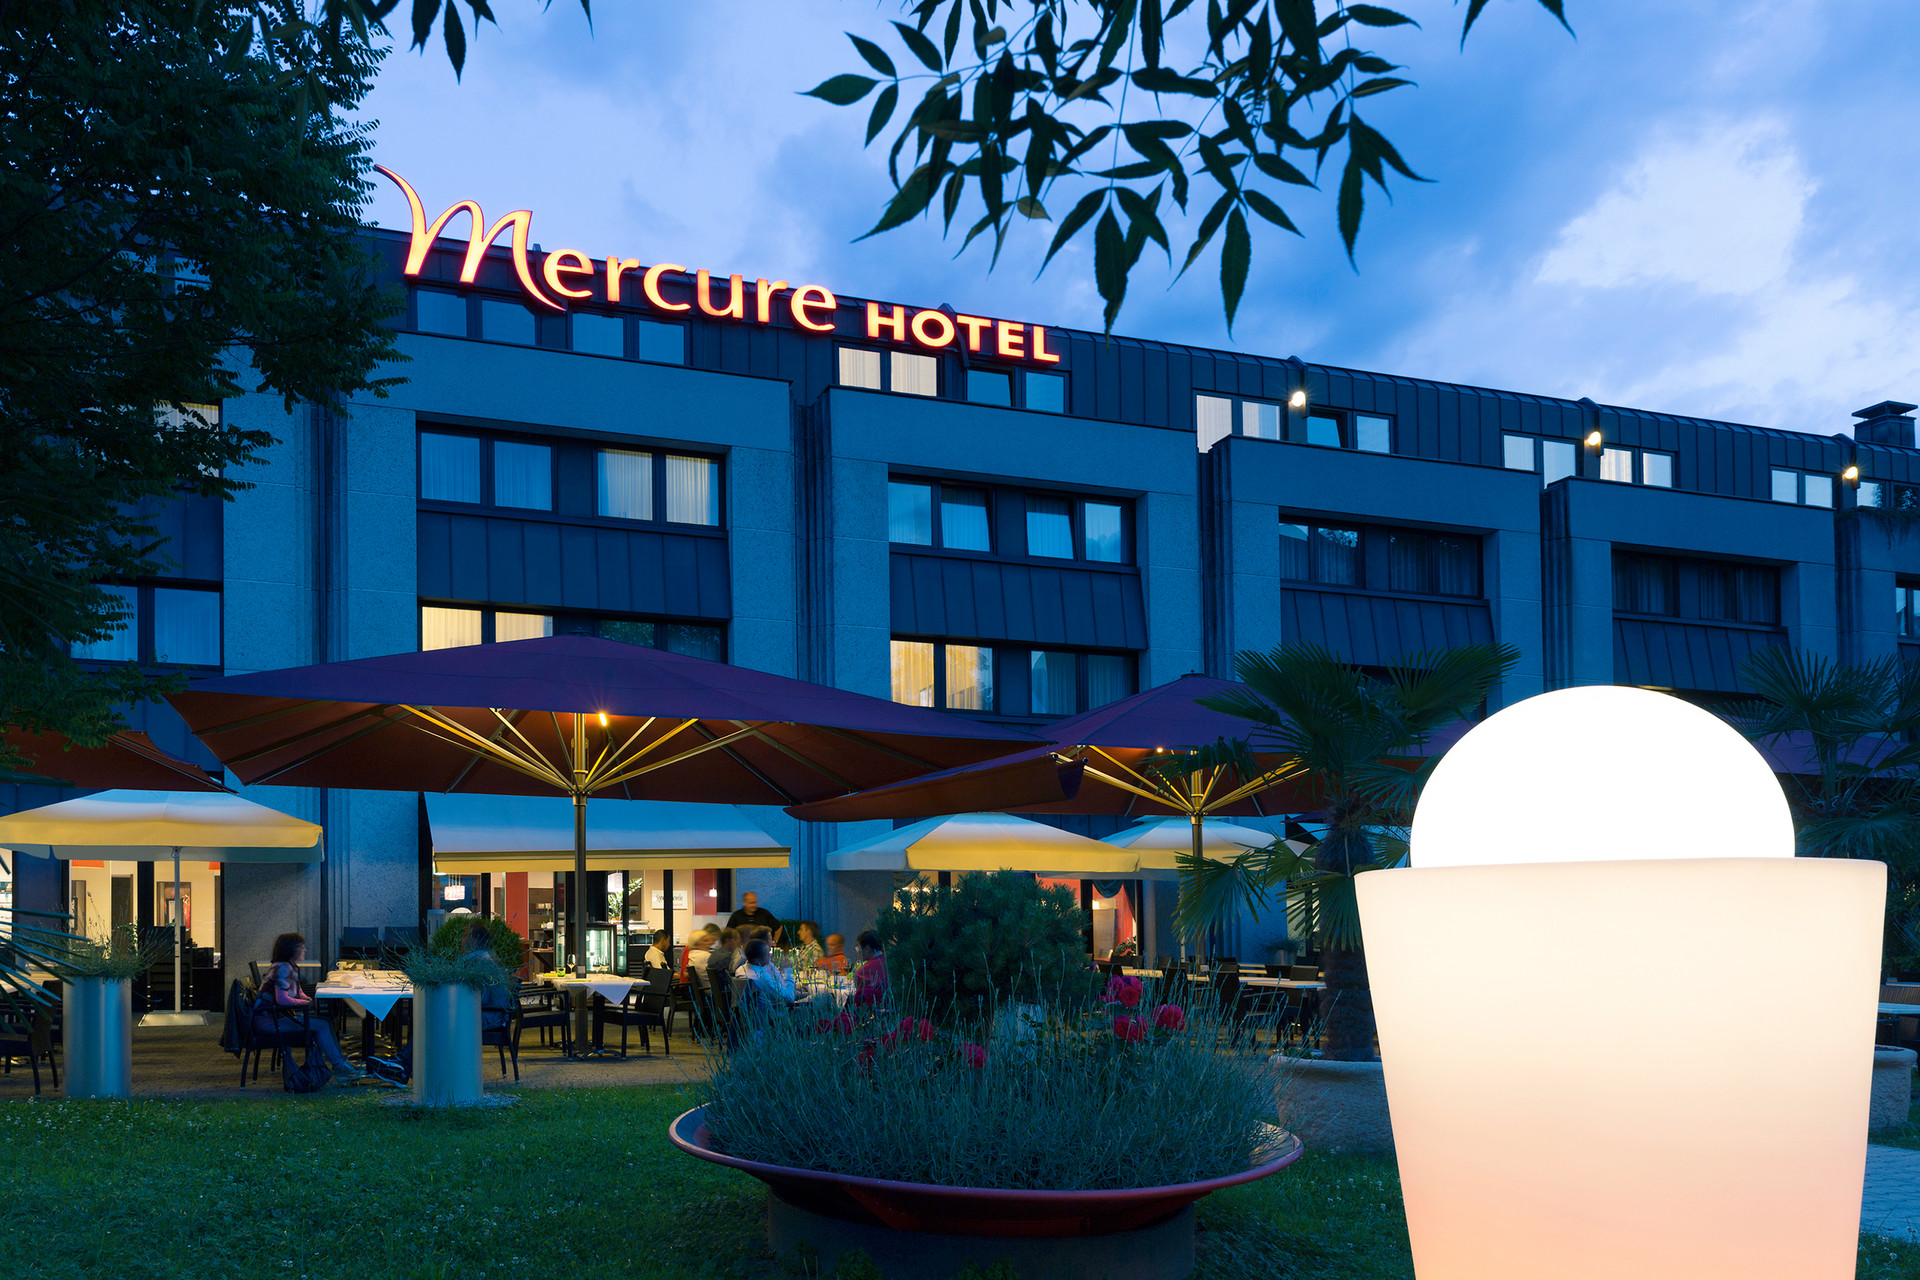 Mercure Bregenz